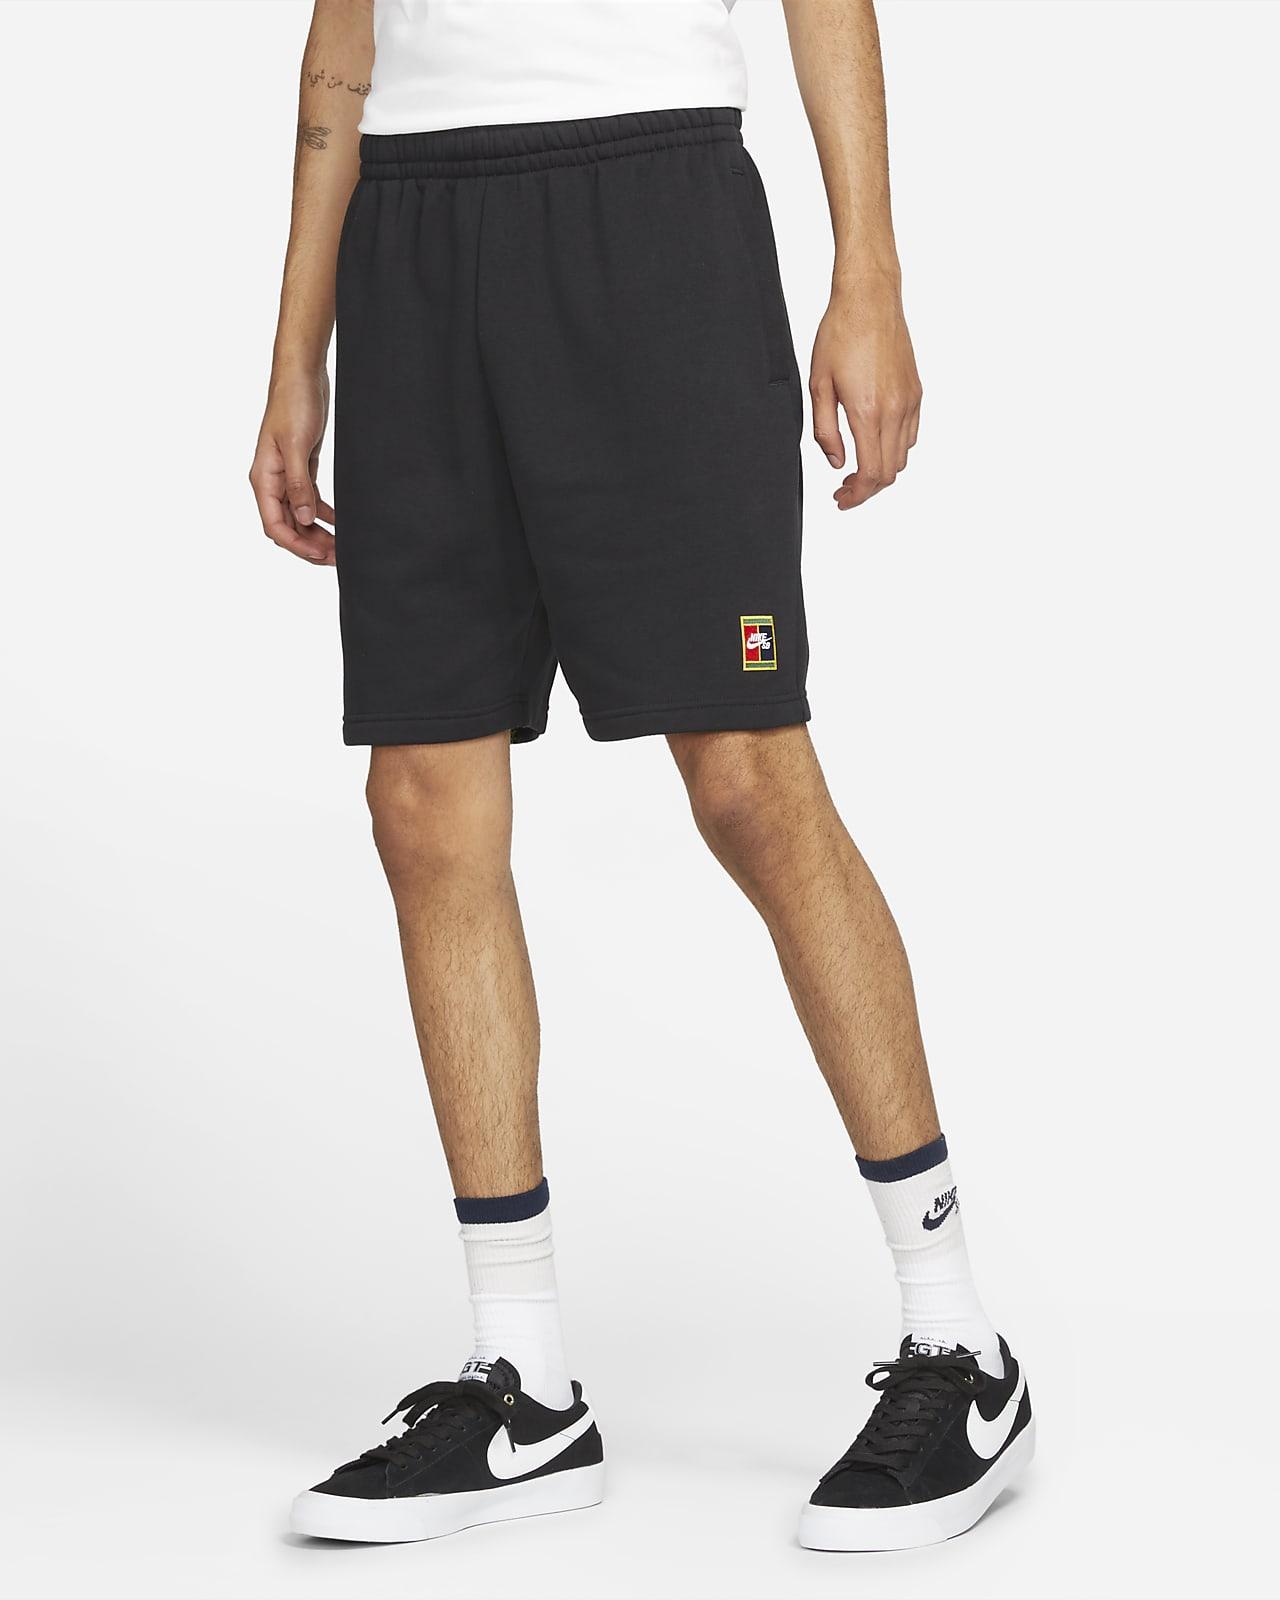 Nike SB Skateboard-Shorts aus Fleece mit Grafik